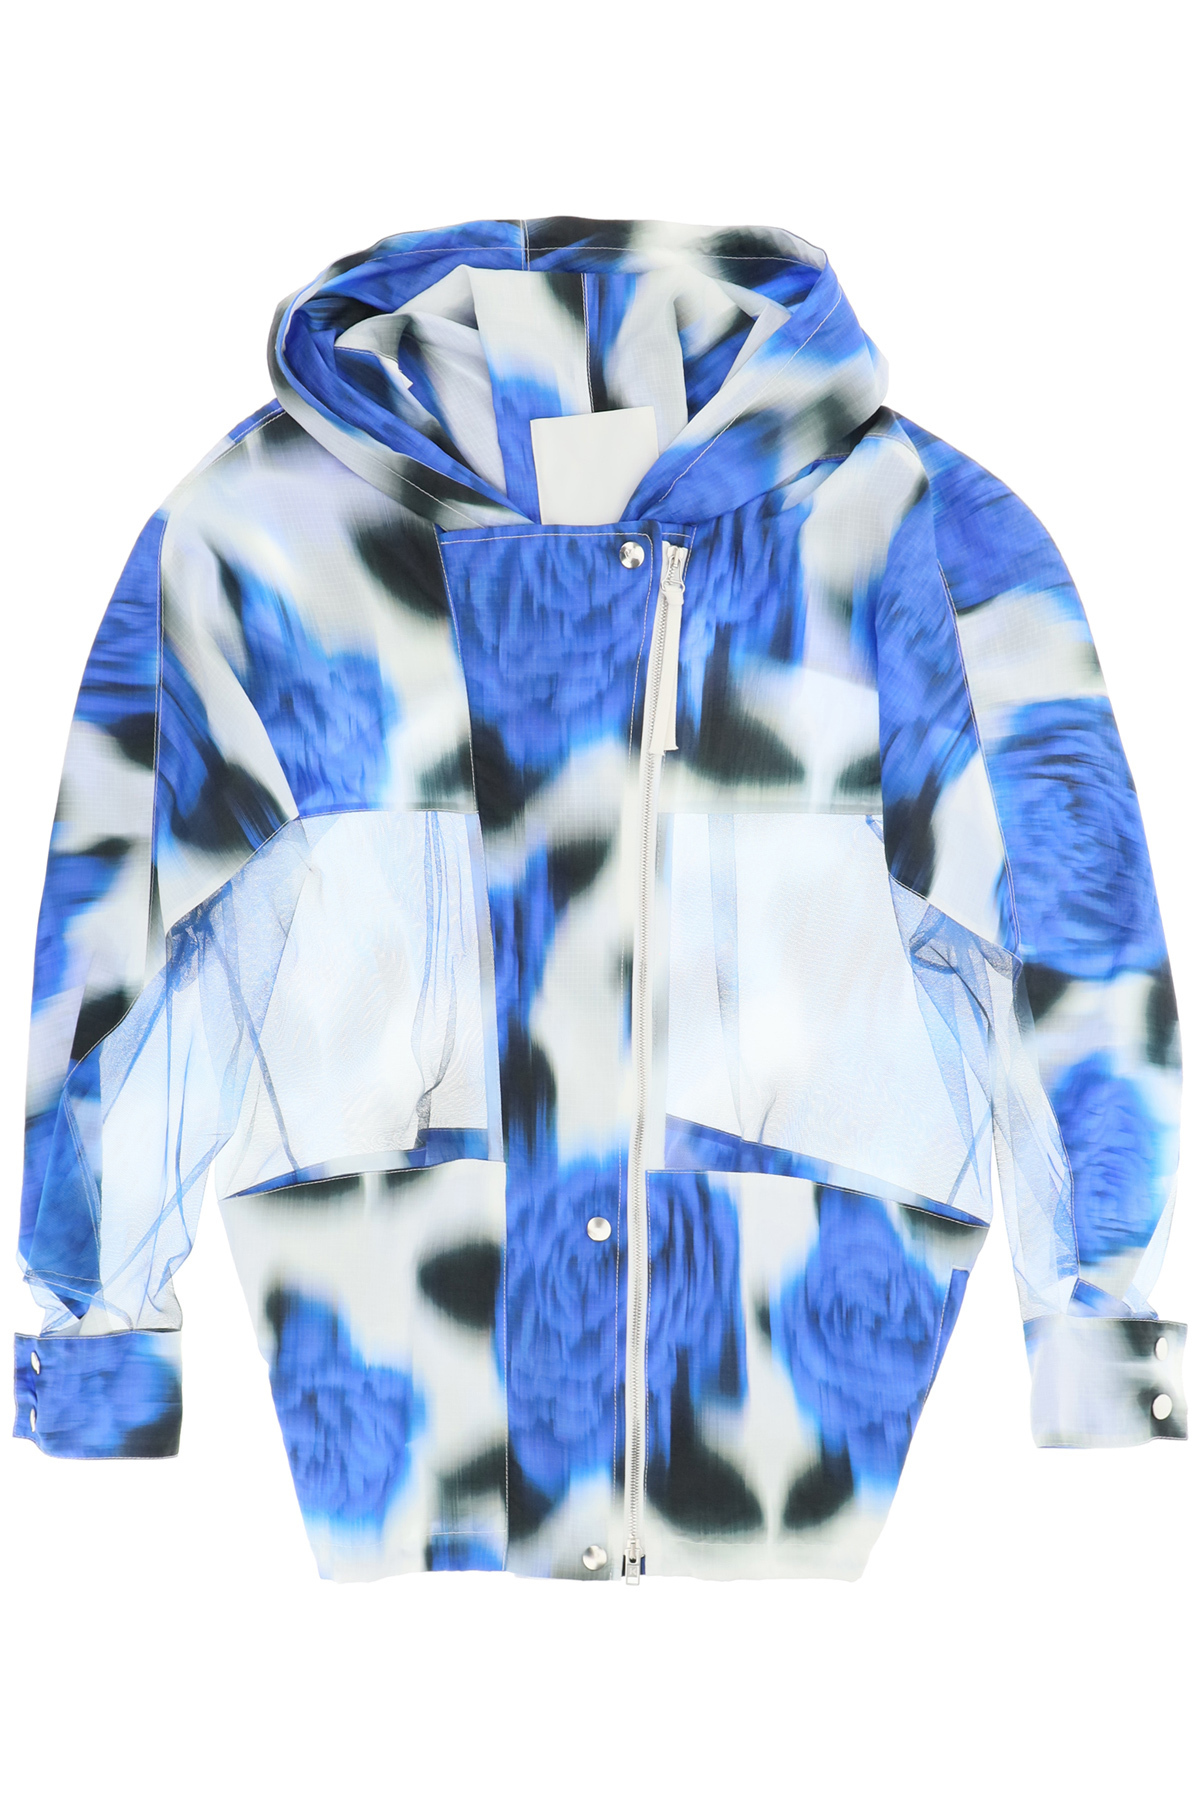 Kenzo giacca a vento stampa floreale effetto sfocato